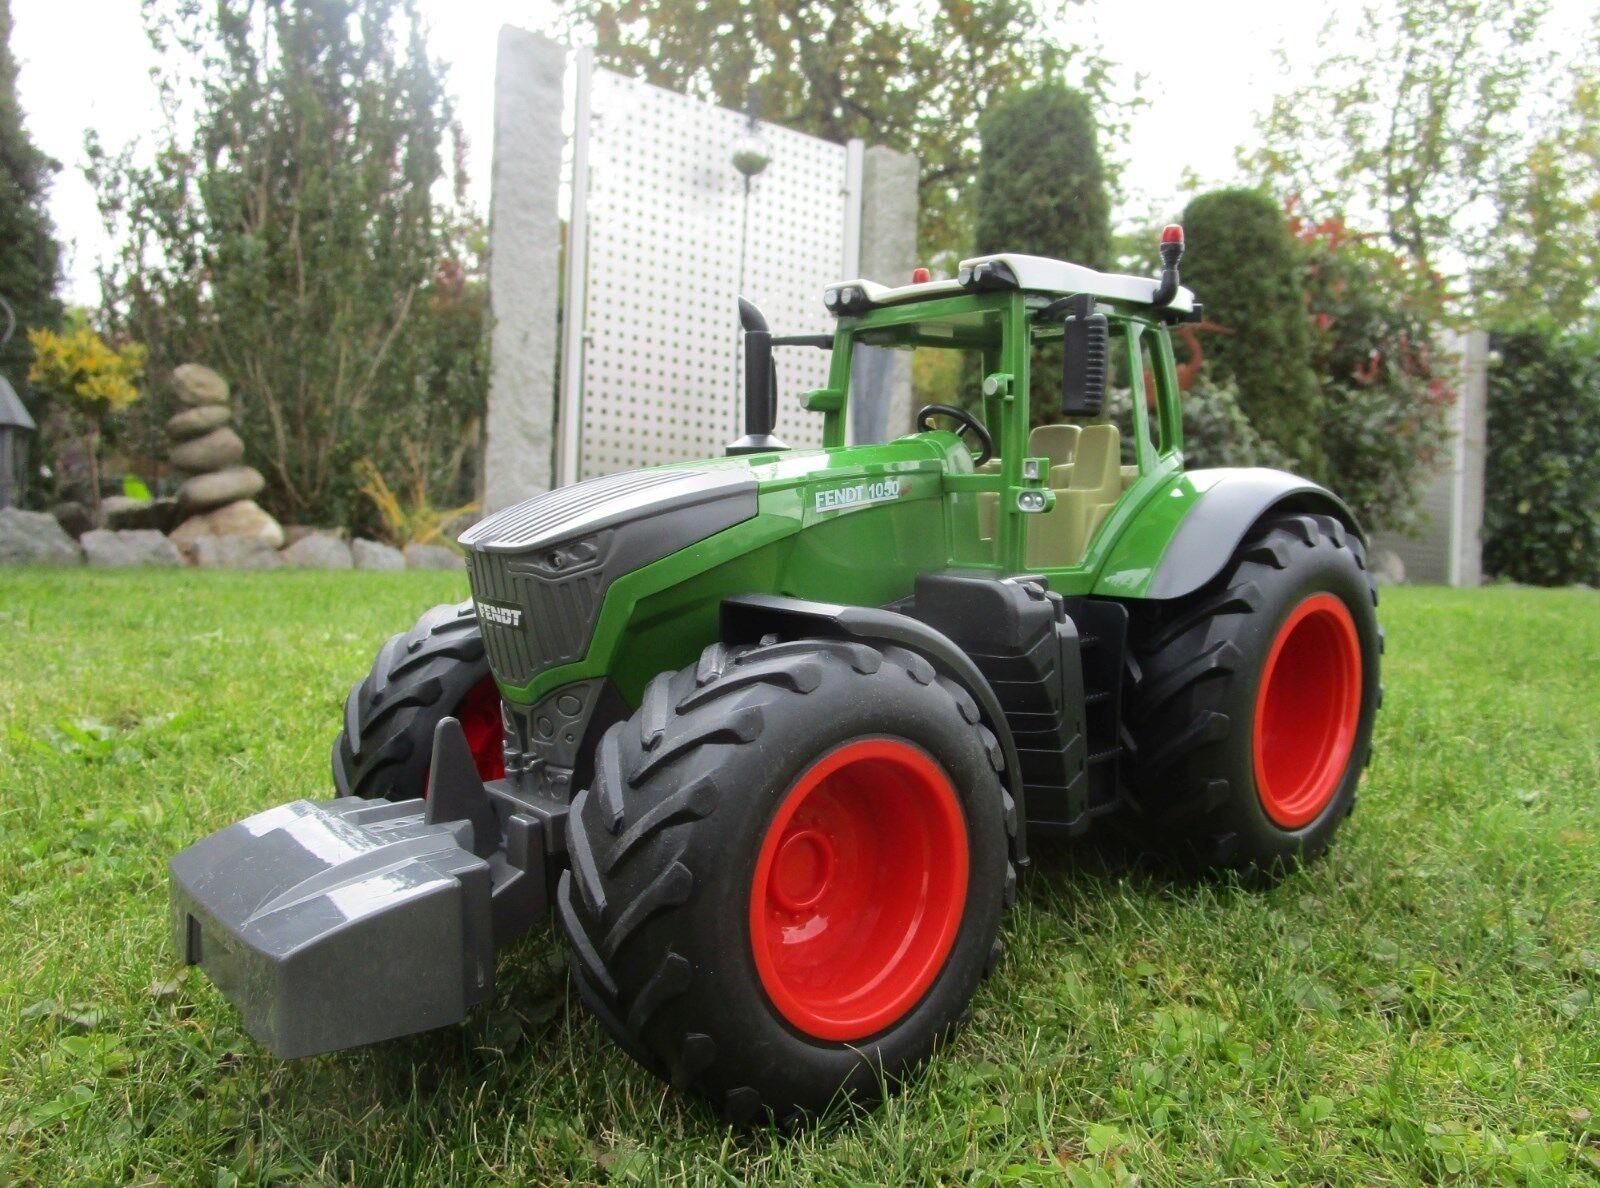 rc traktor test vergleich rc traktor g nstig kaufen. Black Bedroom Furniture Sets. Home Design Ideas